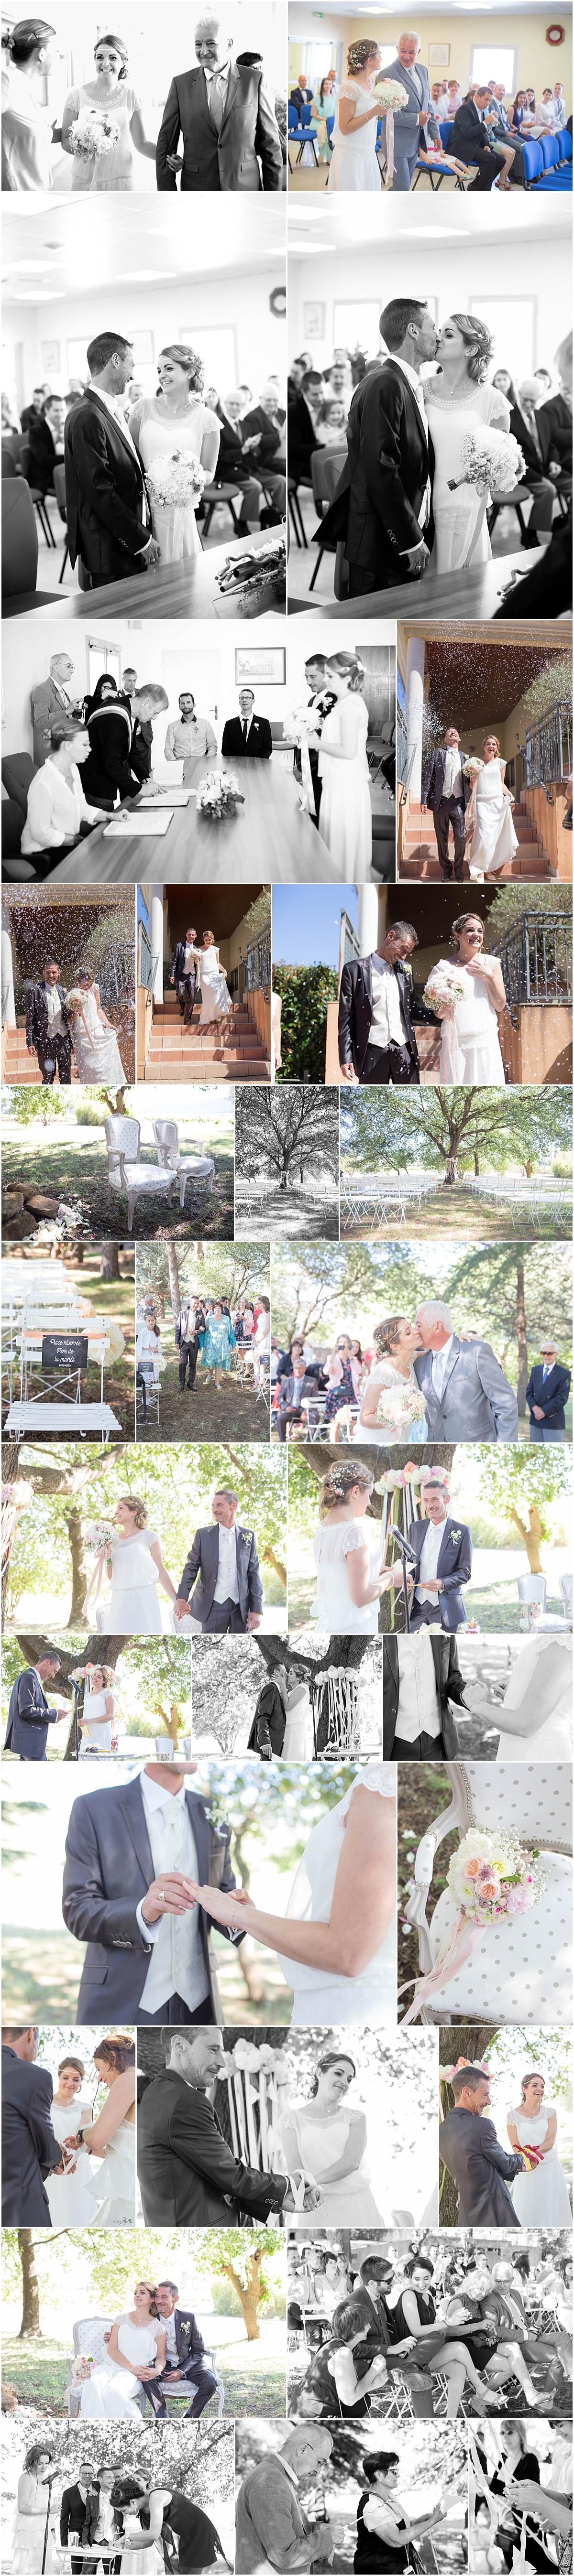 photographe mariage toulon